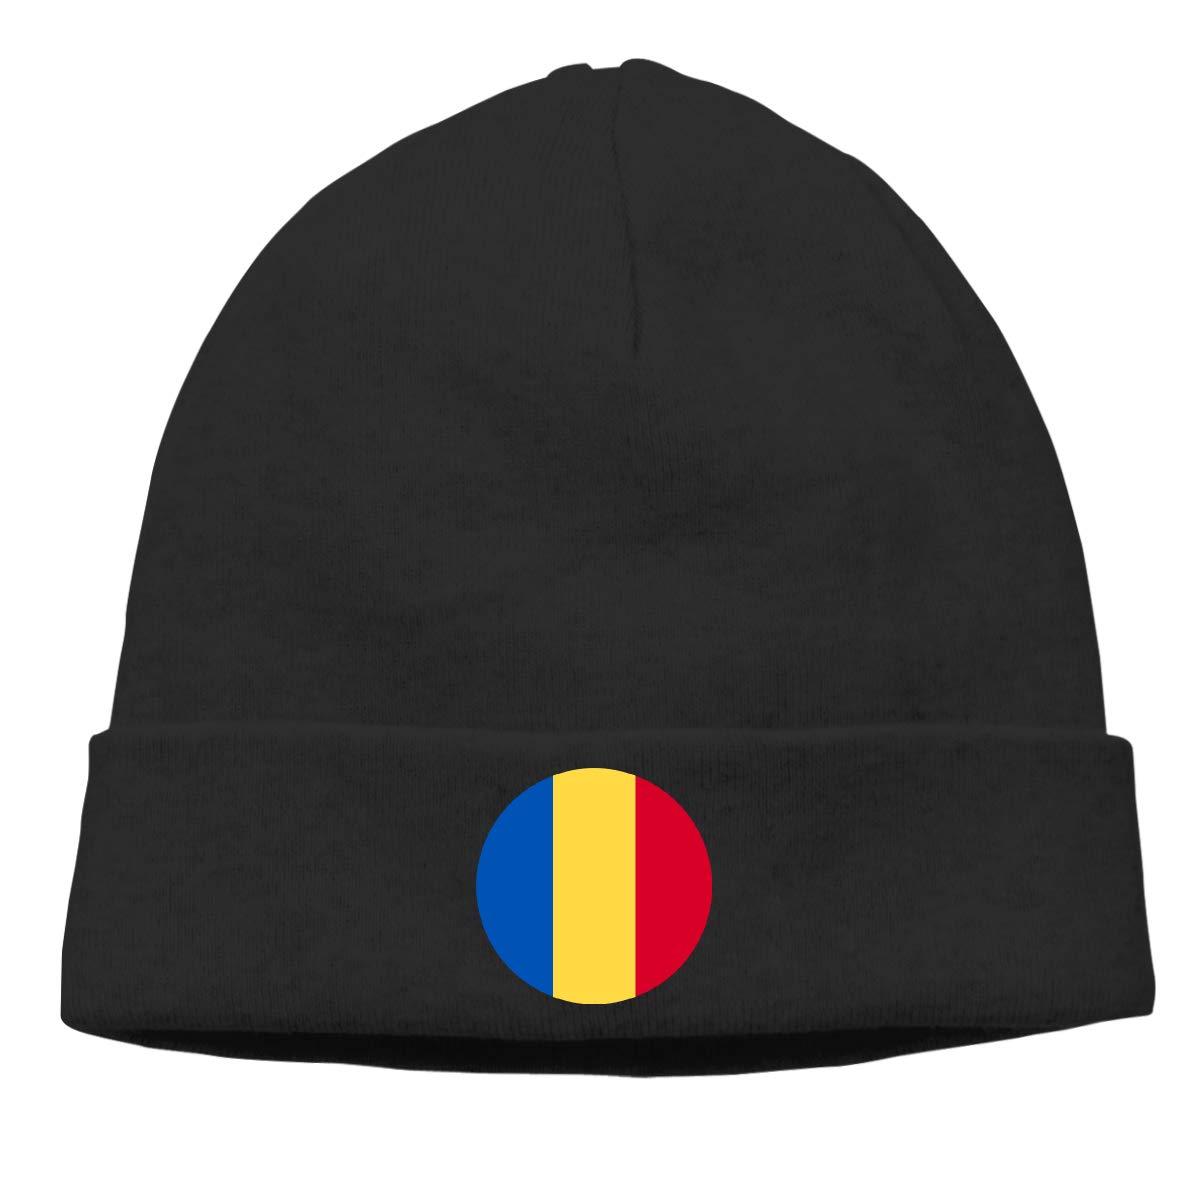 Nskngr Romania Cap Men /& Women Warm Serious Beanies Beanie Skull Cap